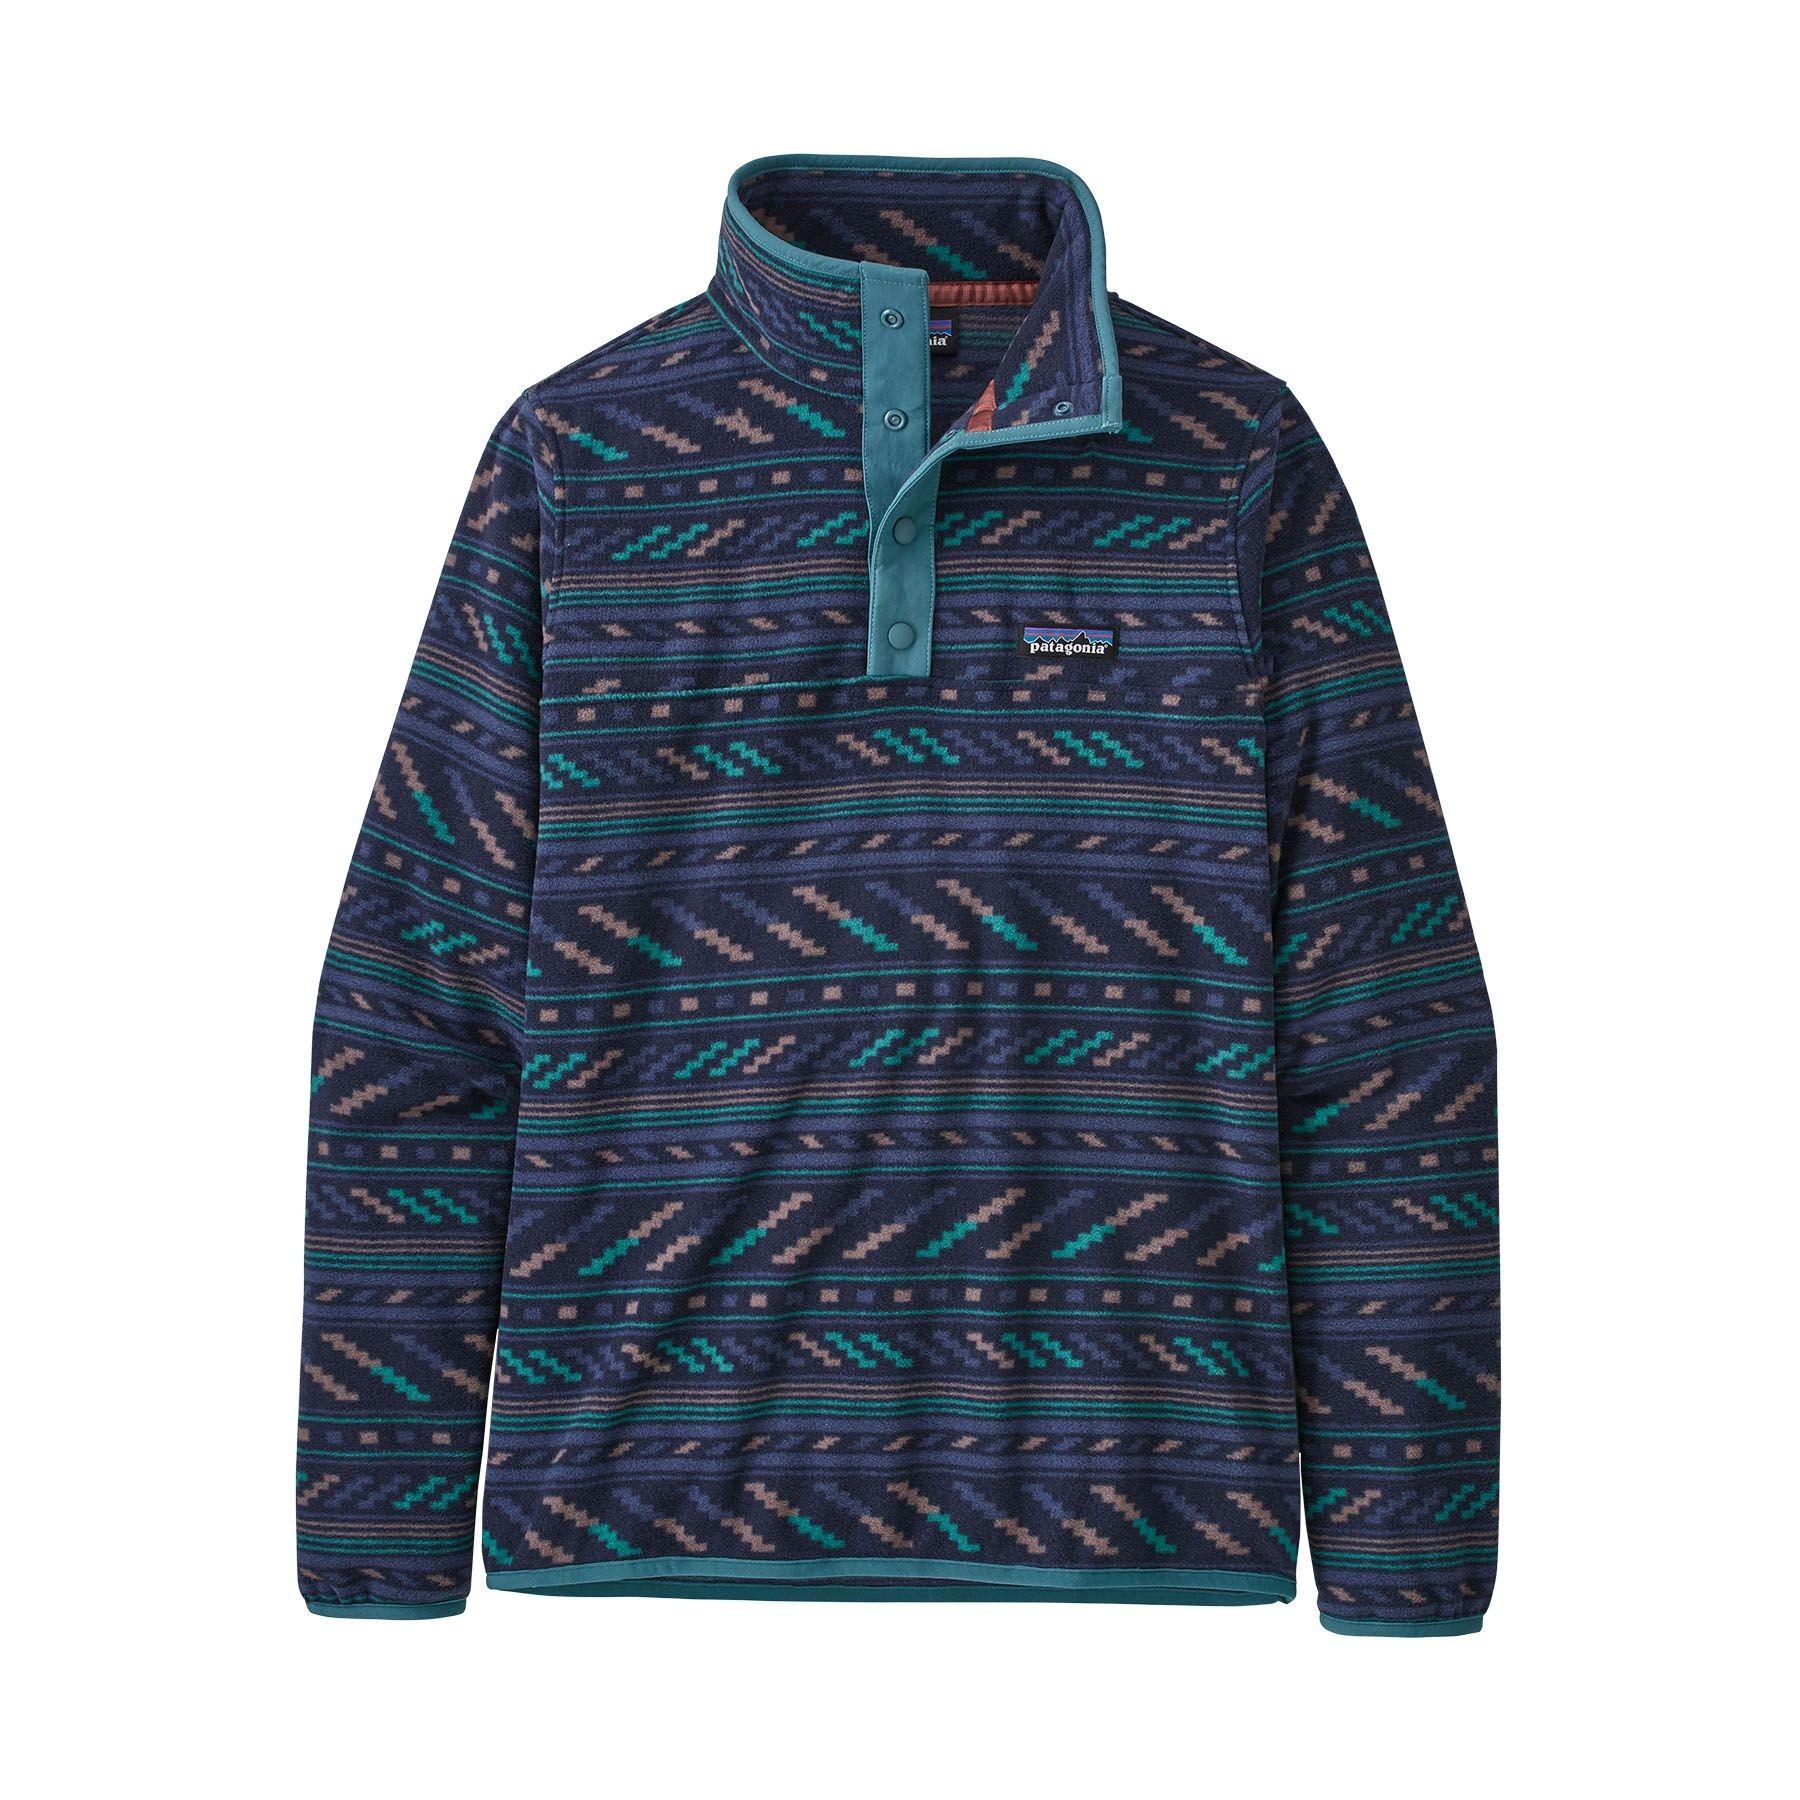 Patagonia Micro D Snap-T P/O - Fleece jacket - Women's